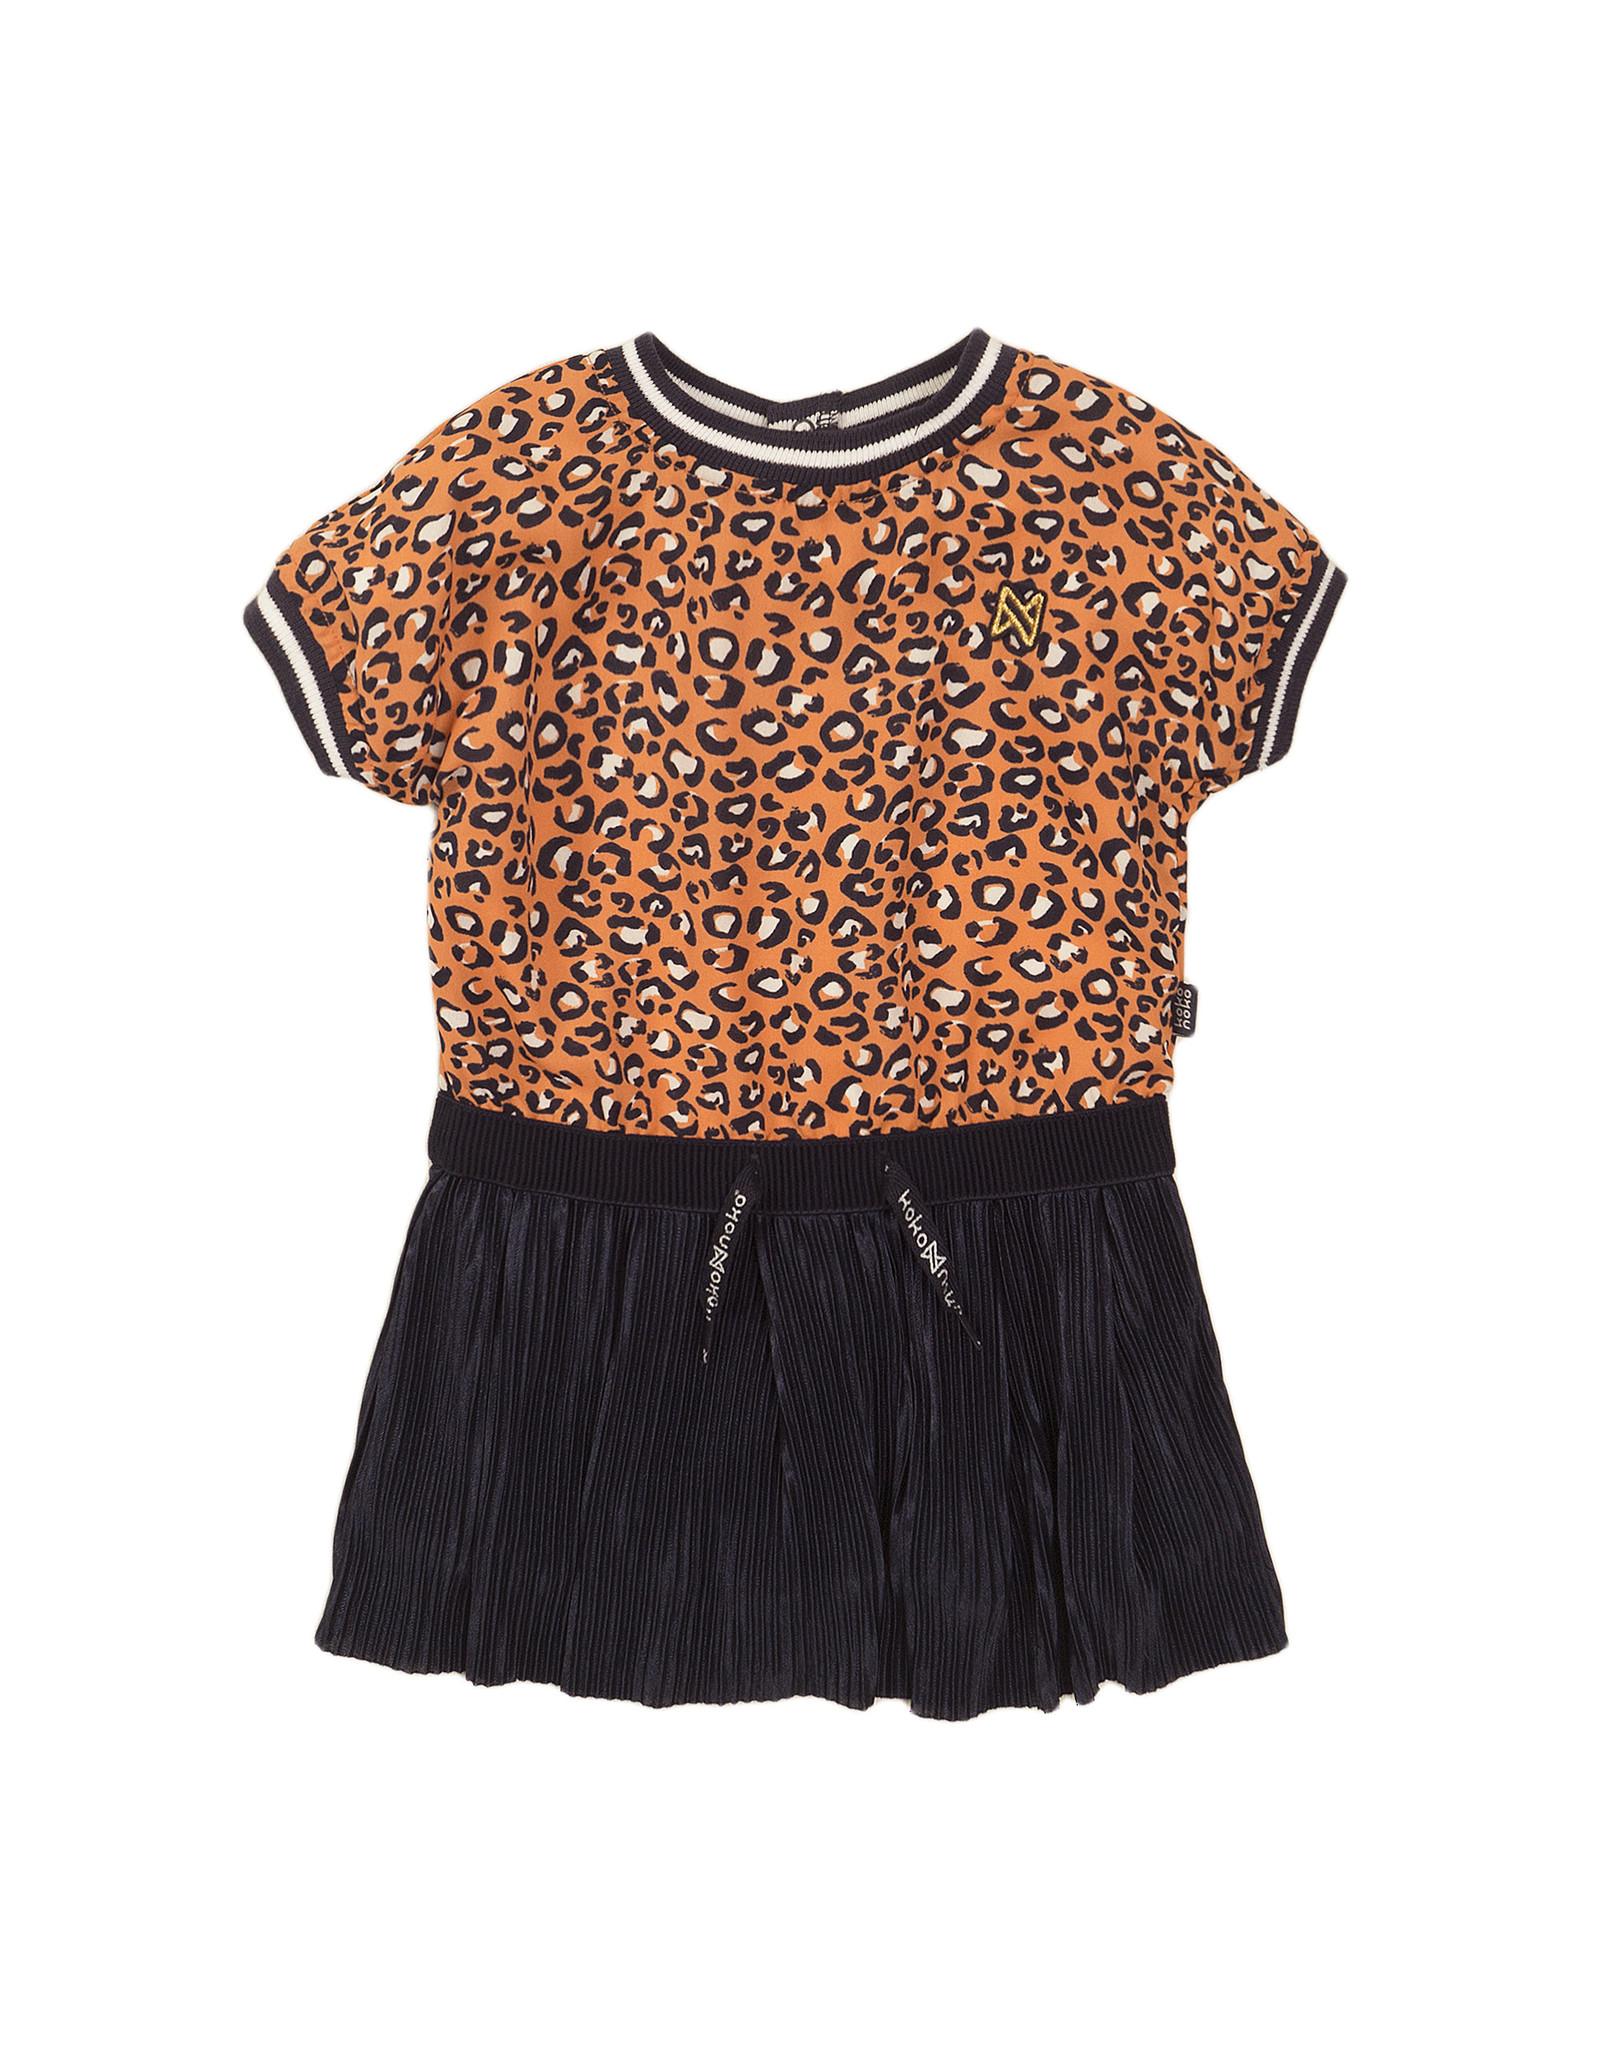 Koko Noko Koko Noko meisjes jurk panterprint Navy Orange